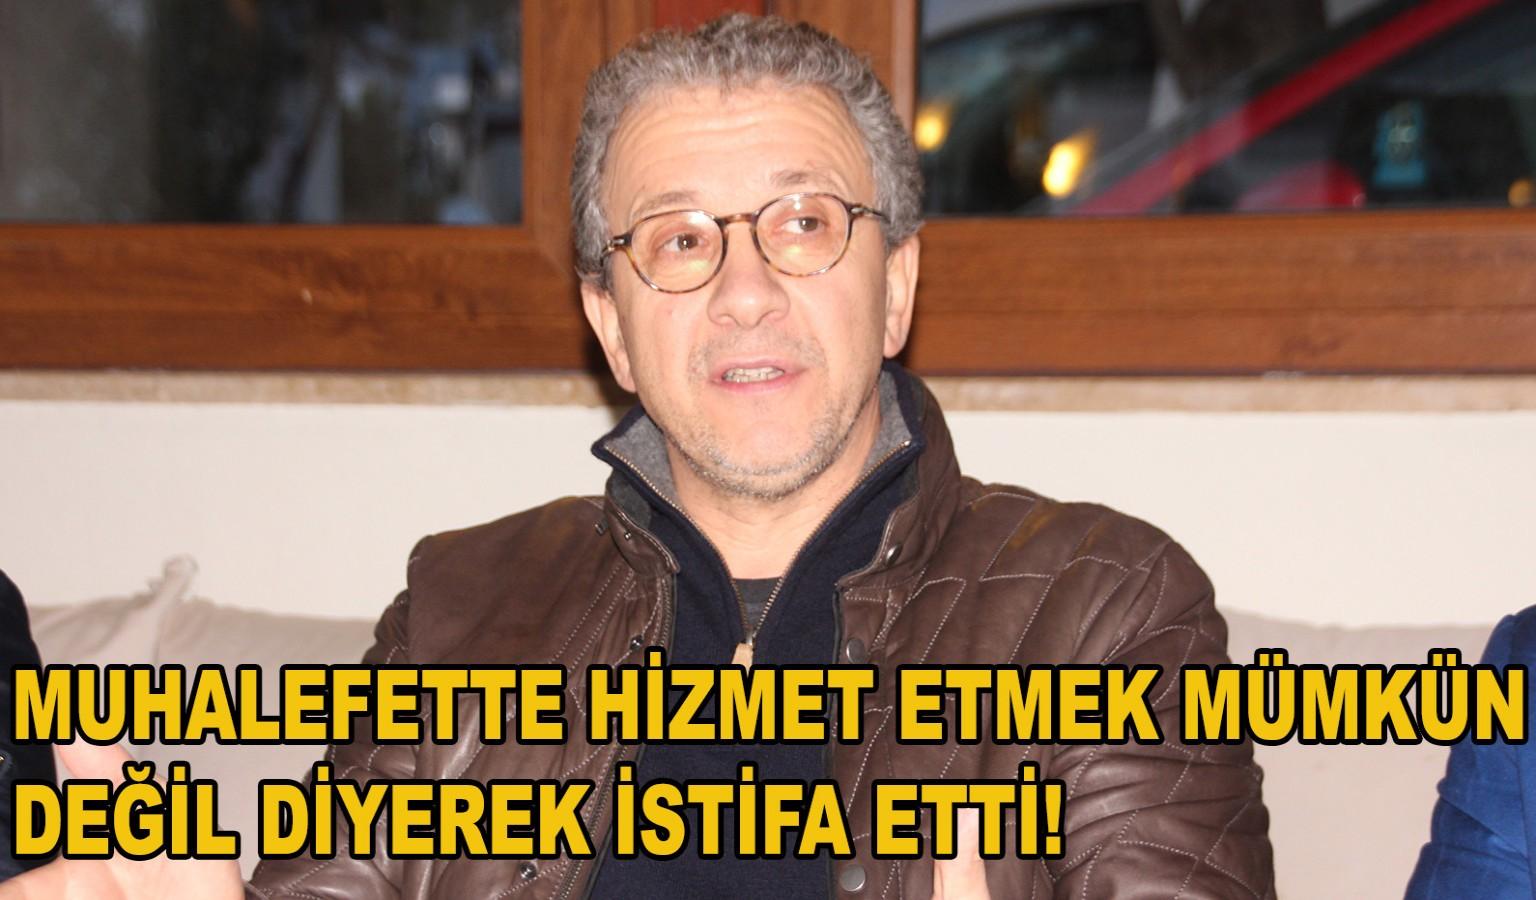 PAŞALI, MECLİS ÜYELİĞİNDEN İSTİFA ETTİ!